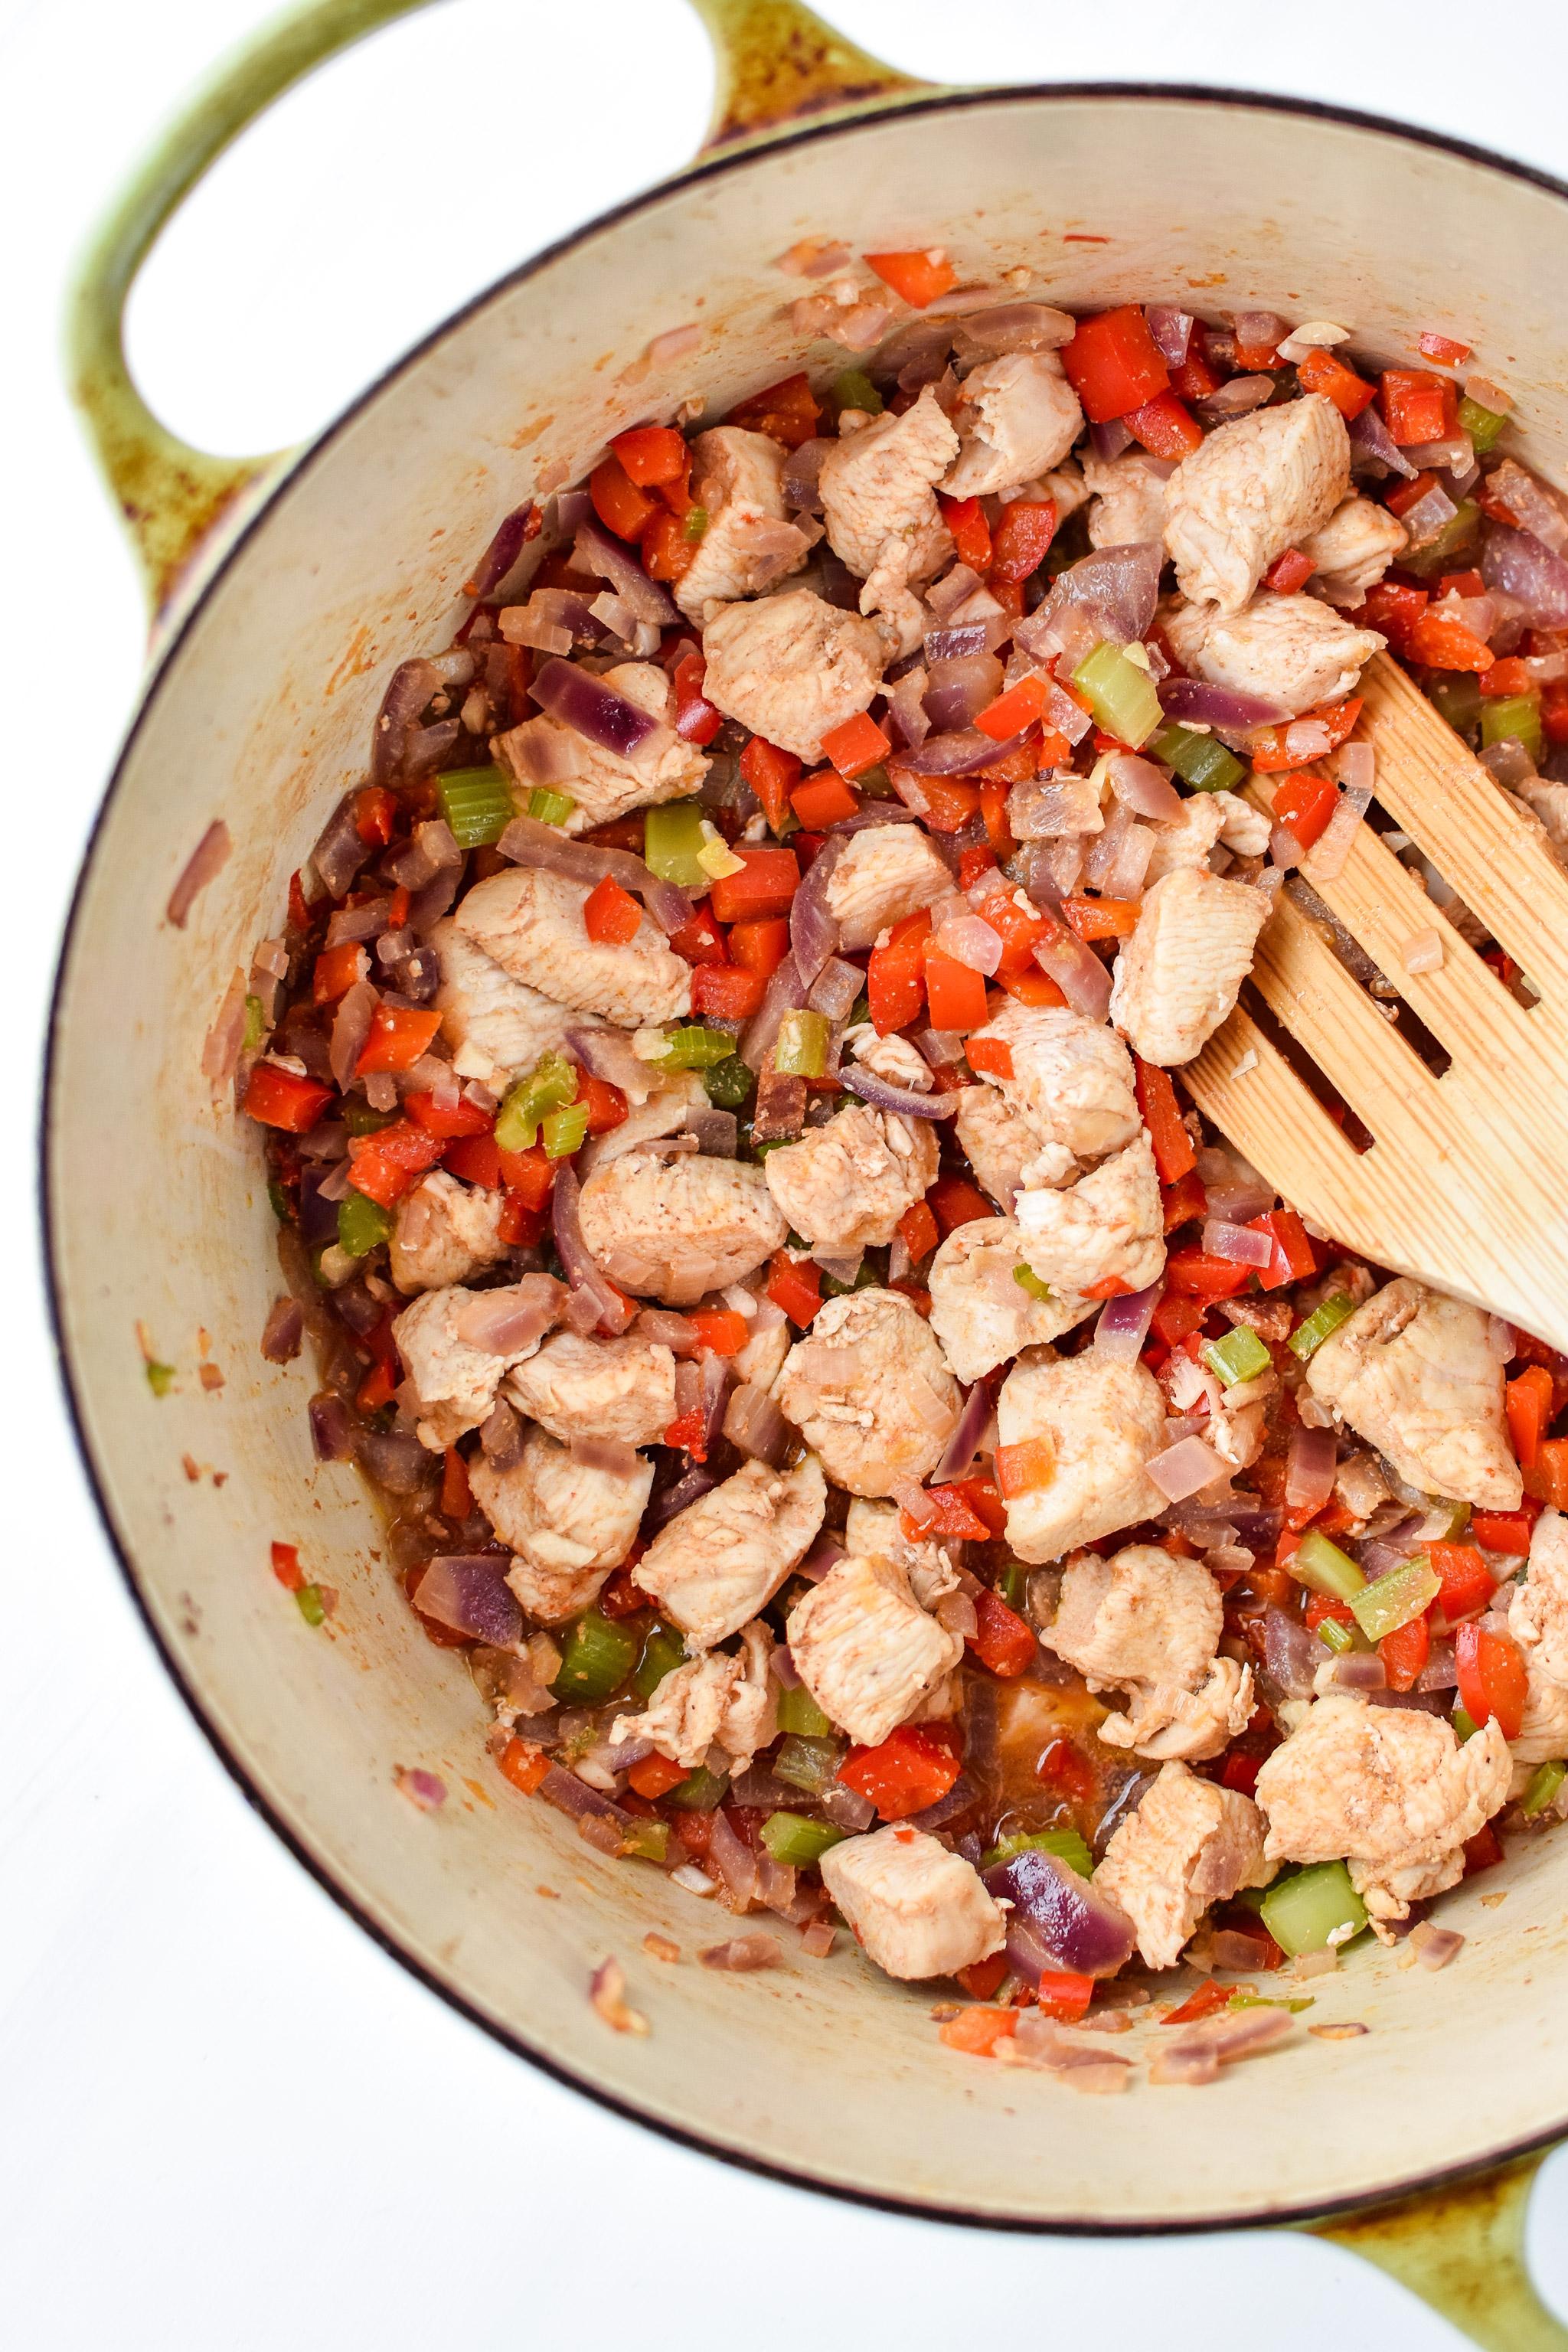 Chicken & veggie mixture for the Whole30 Chicken Bacon Ranch Casserole